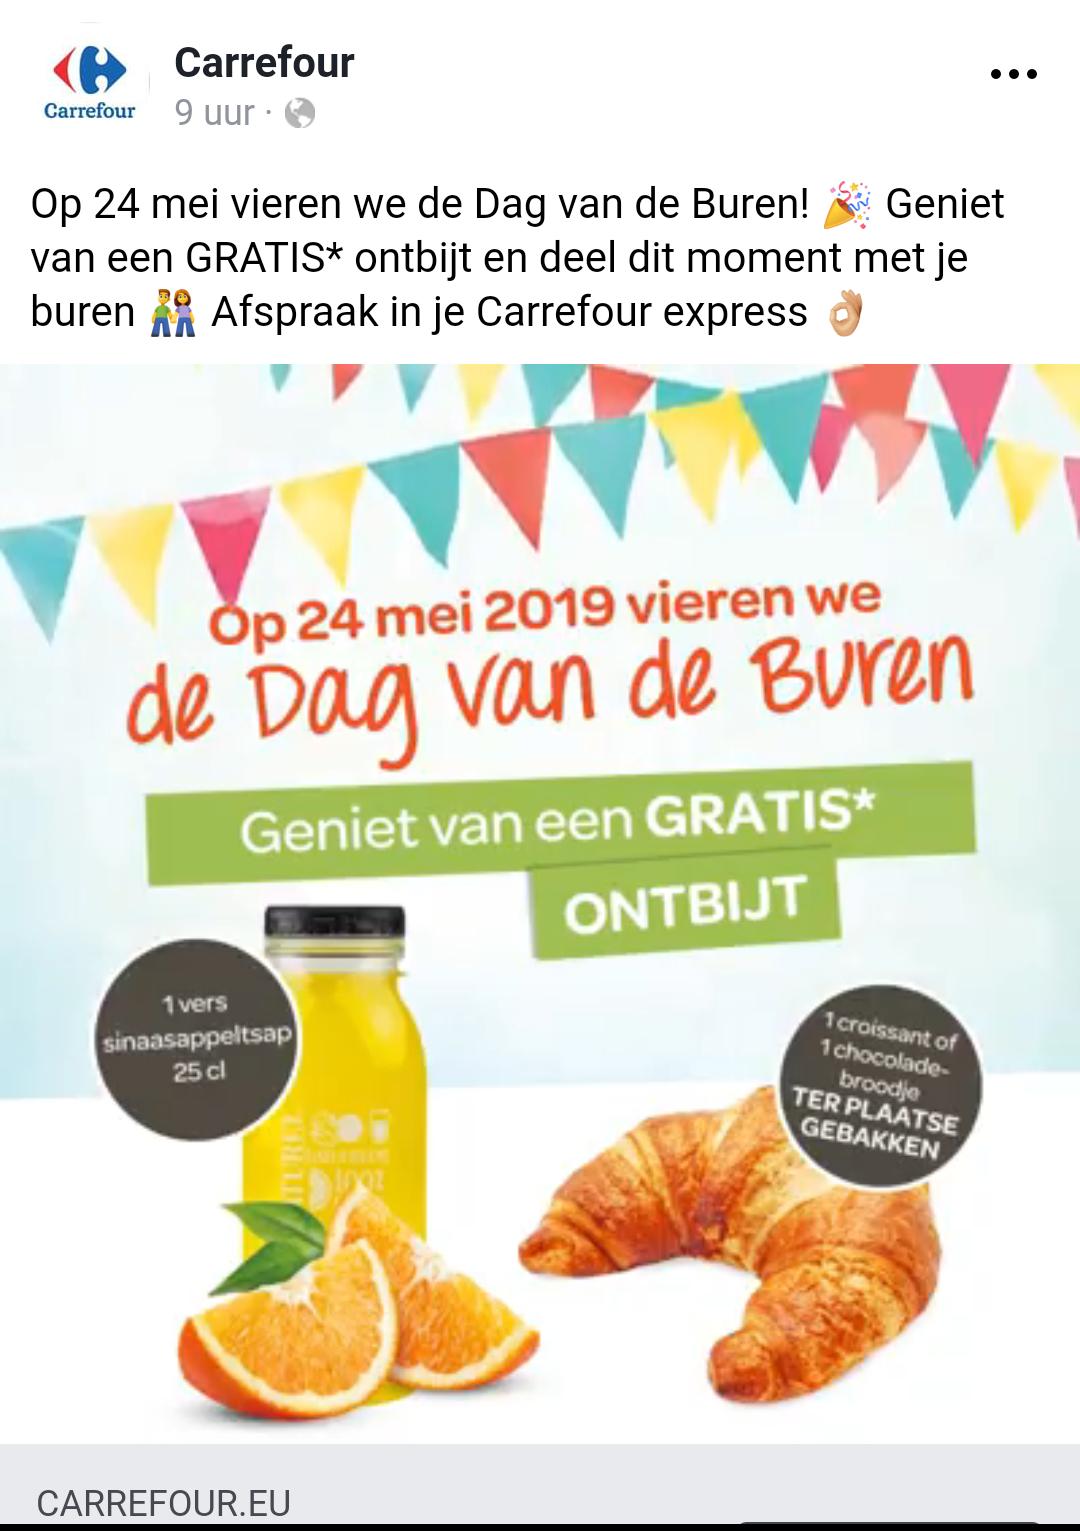 [Grensdeal België] Gratis ontbijt bij Carrefour express